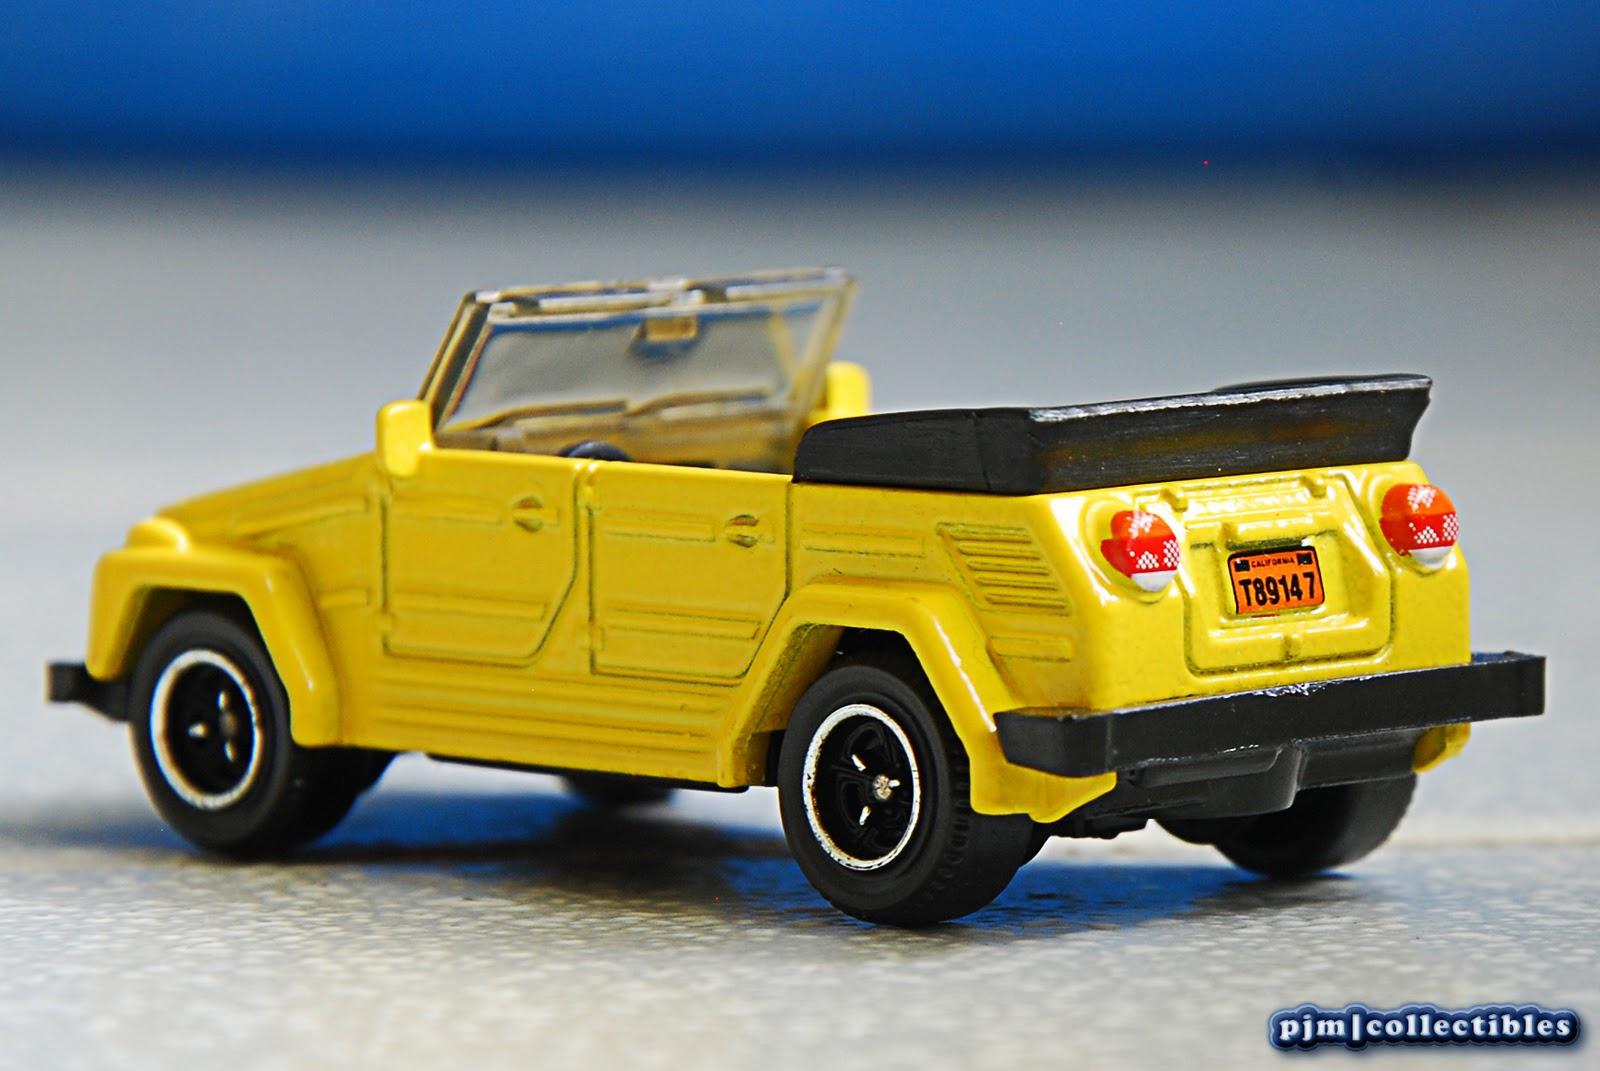 http://3.bp.blogspot.com/-EKu0jU8HUO4/TtXAJRiEpaI/AAAAAAAAAOQ/WcTRTrey-m4/s1600/mbx+thing+yellow+2.jpg